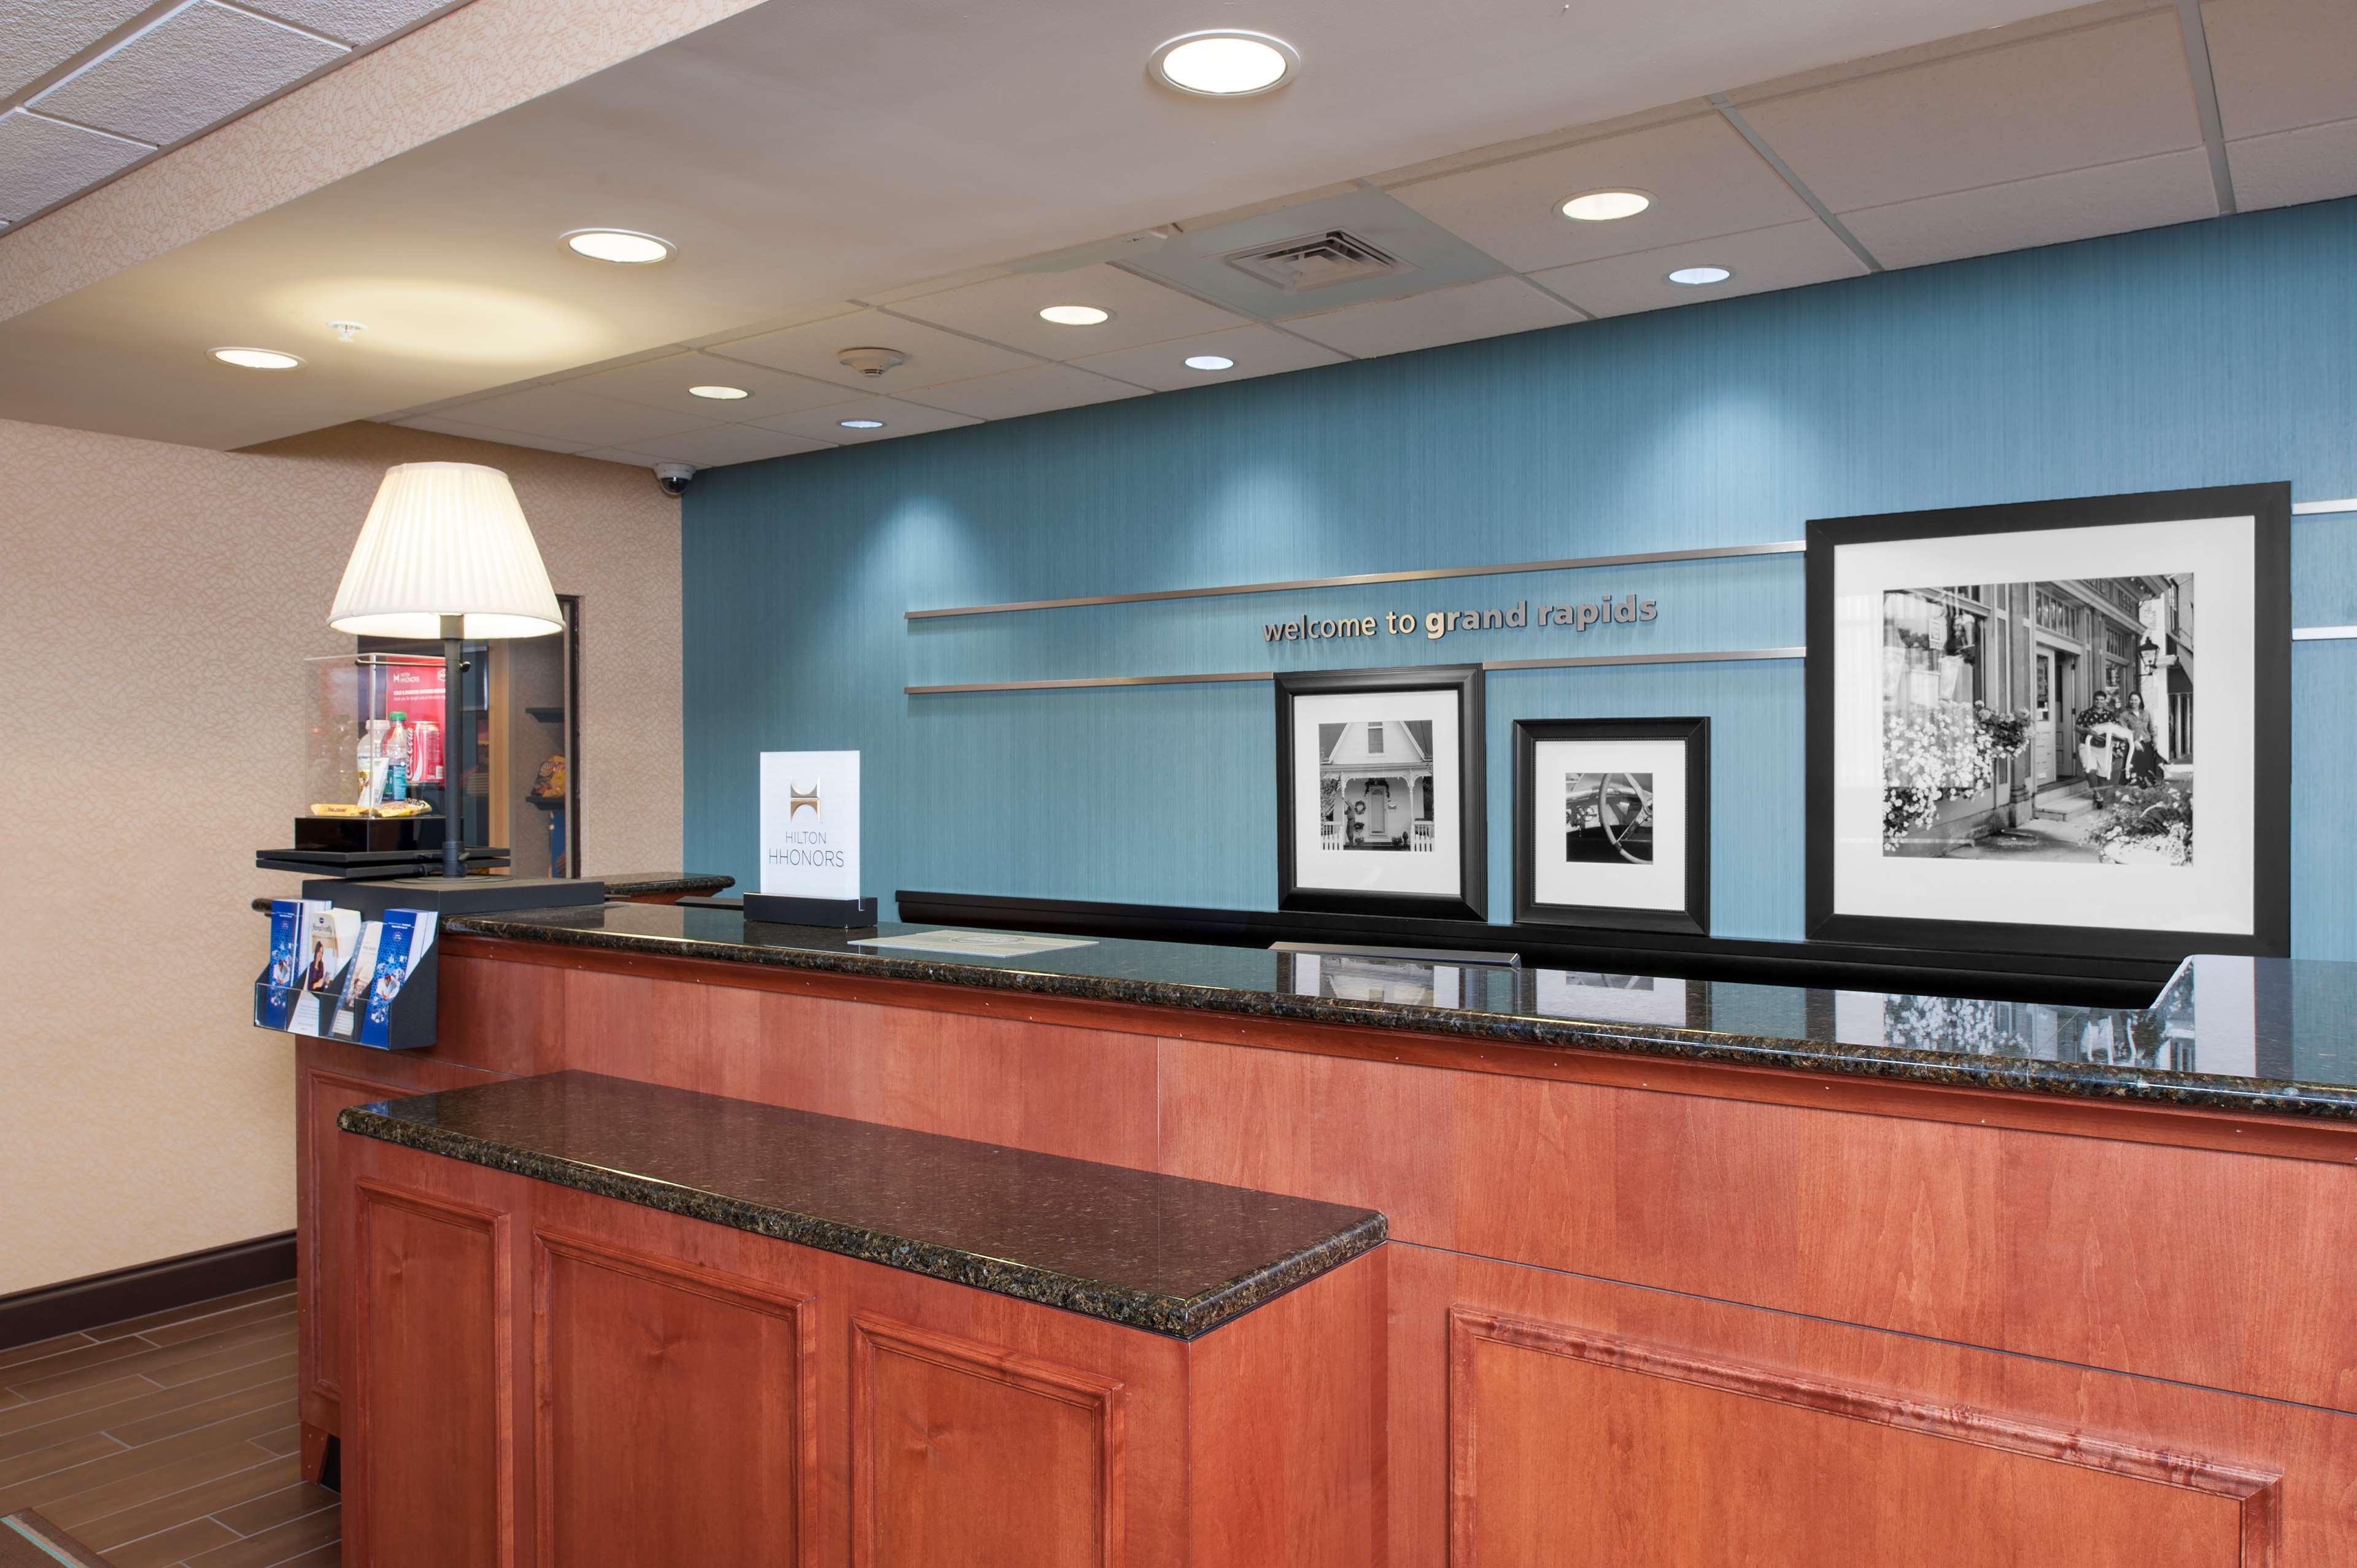 Hampton Inn & Suites Grand Rapids-Airport 28th St image 3